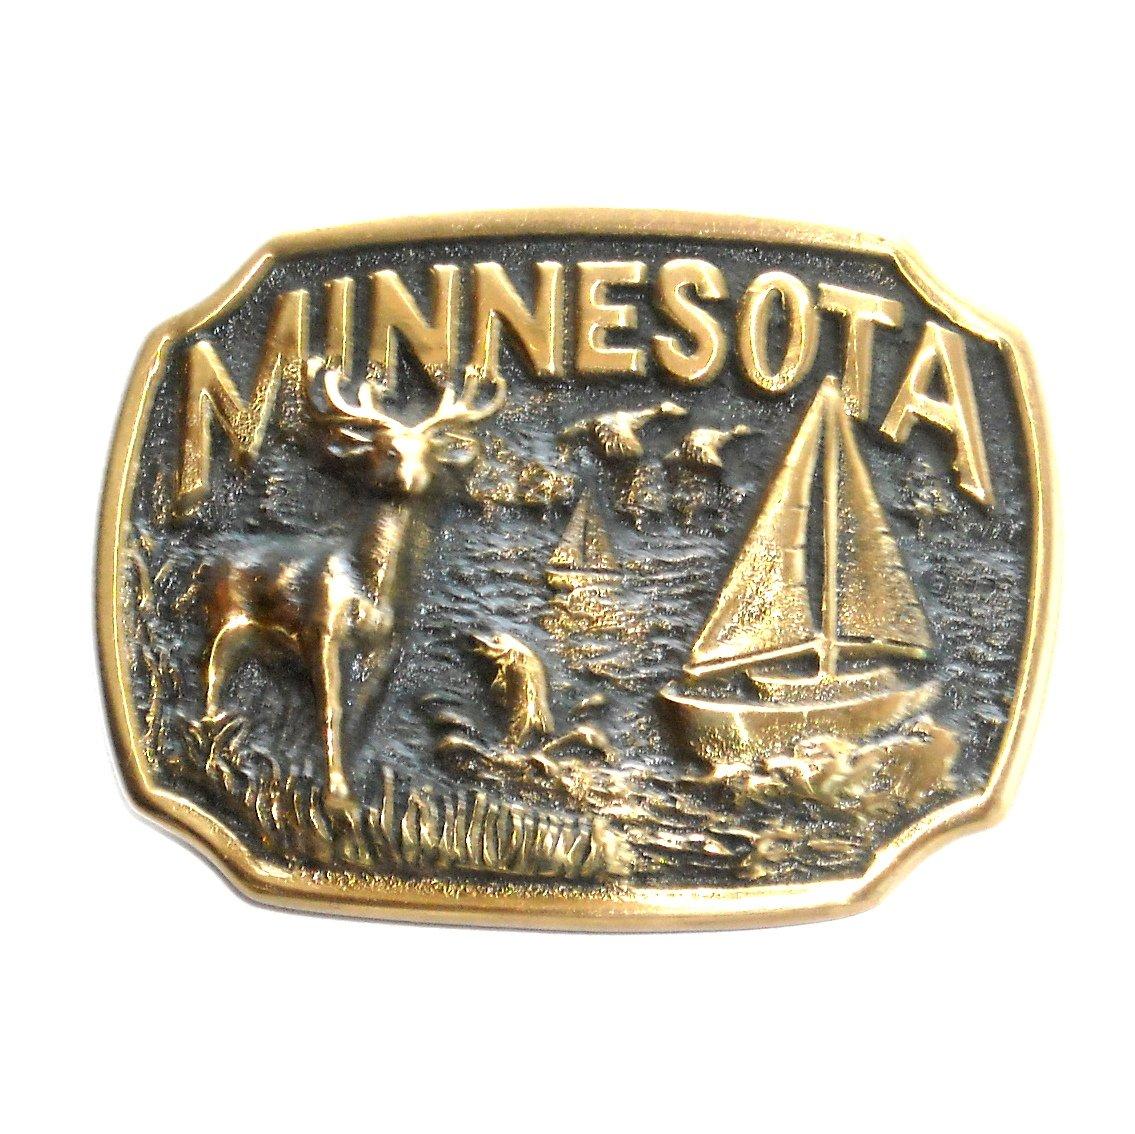 Minnesota Heritage Mint Solid Brass Vintage Belt Buckle